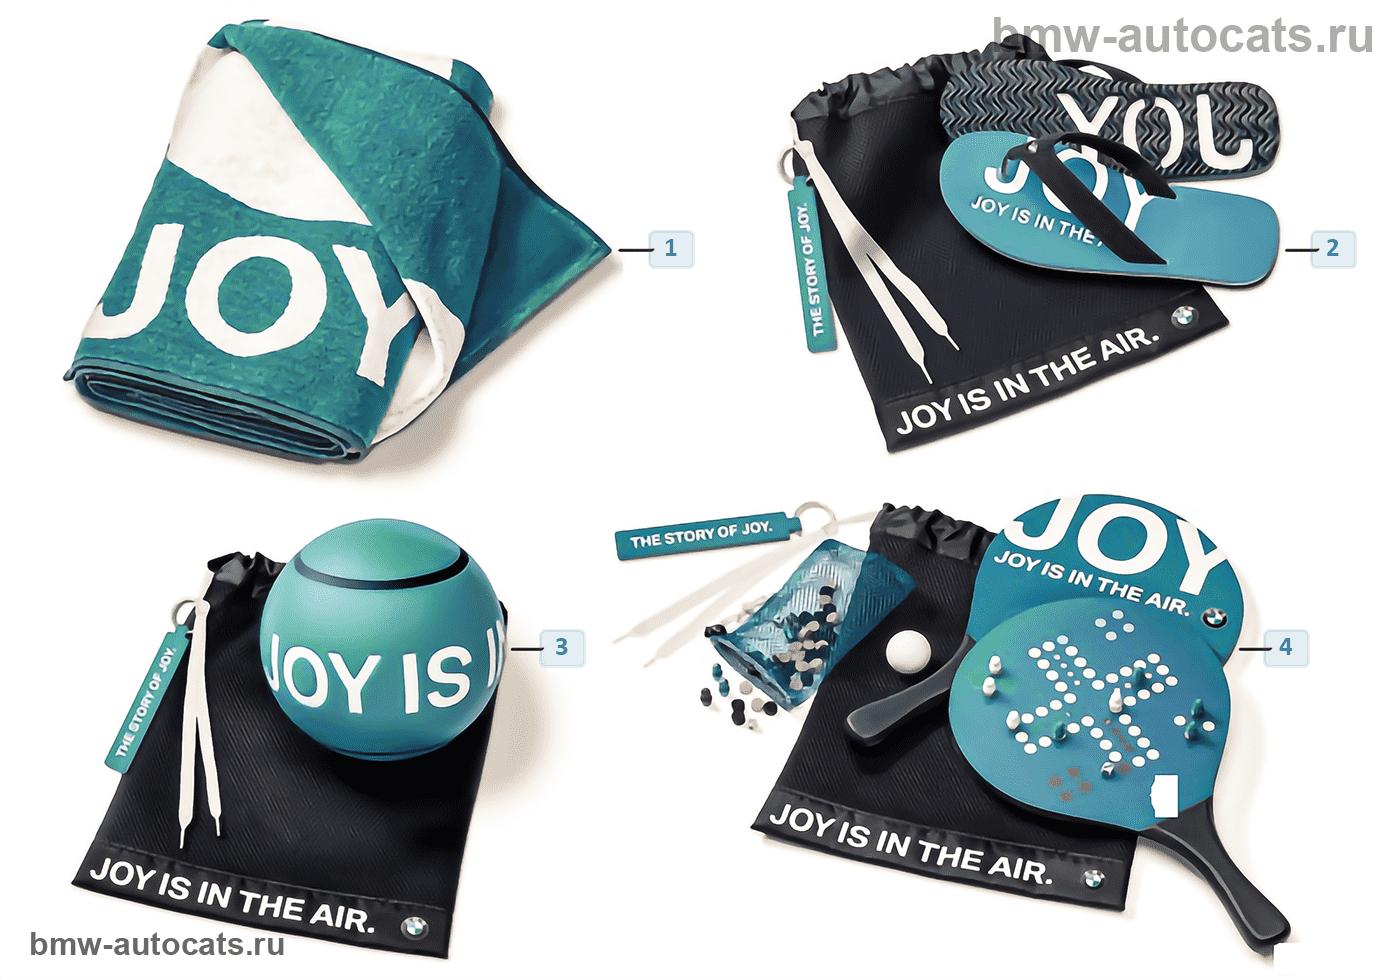 BMW Collection — Joy Strand 2010/11